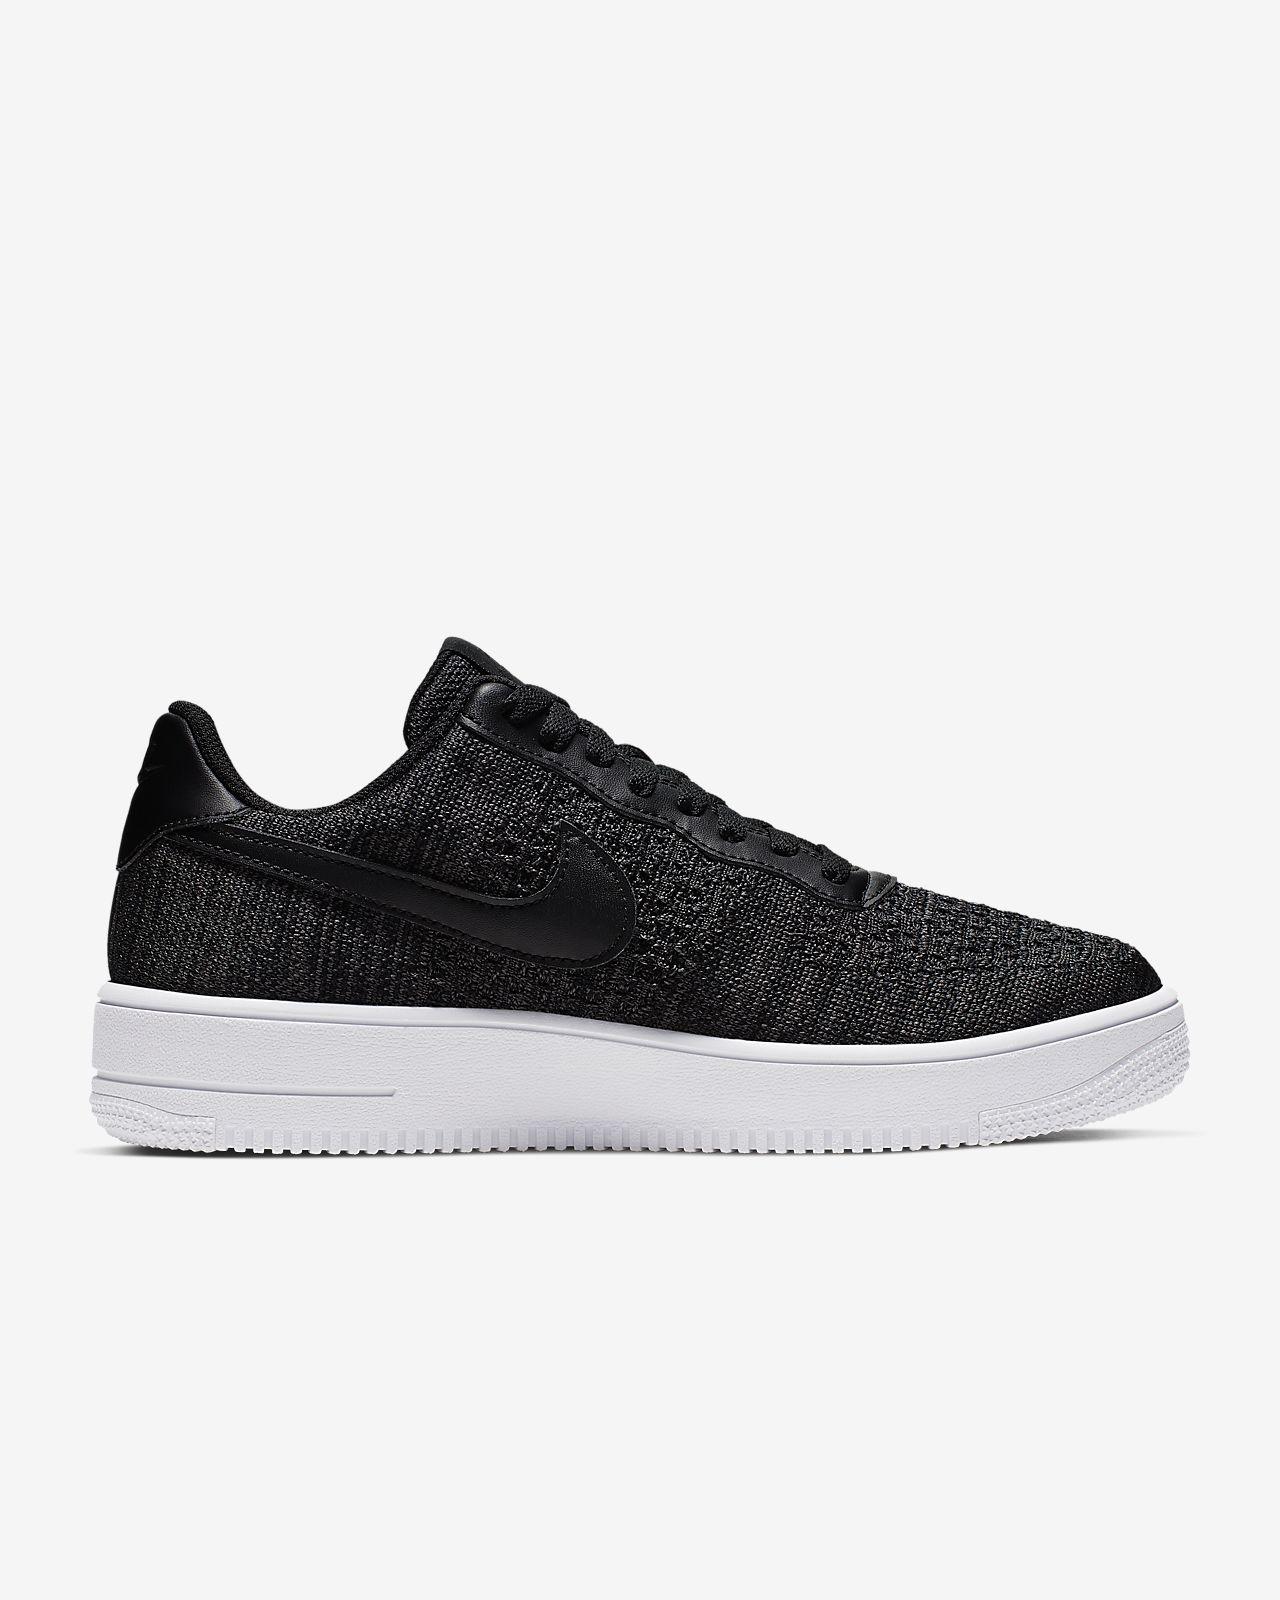 8e0c80a2fcf35 Nike Air Force 1 Flyknit 2.0 Men's Shoe